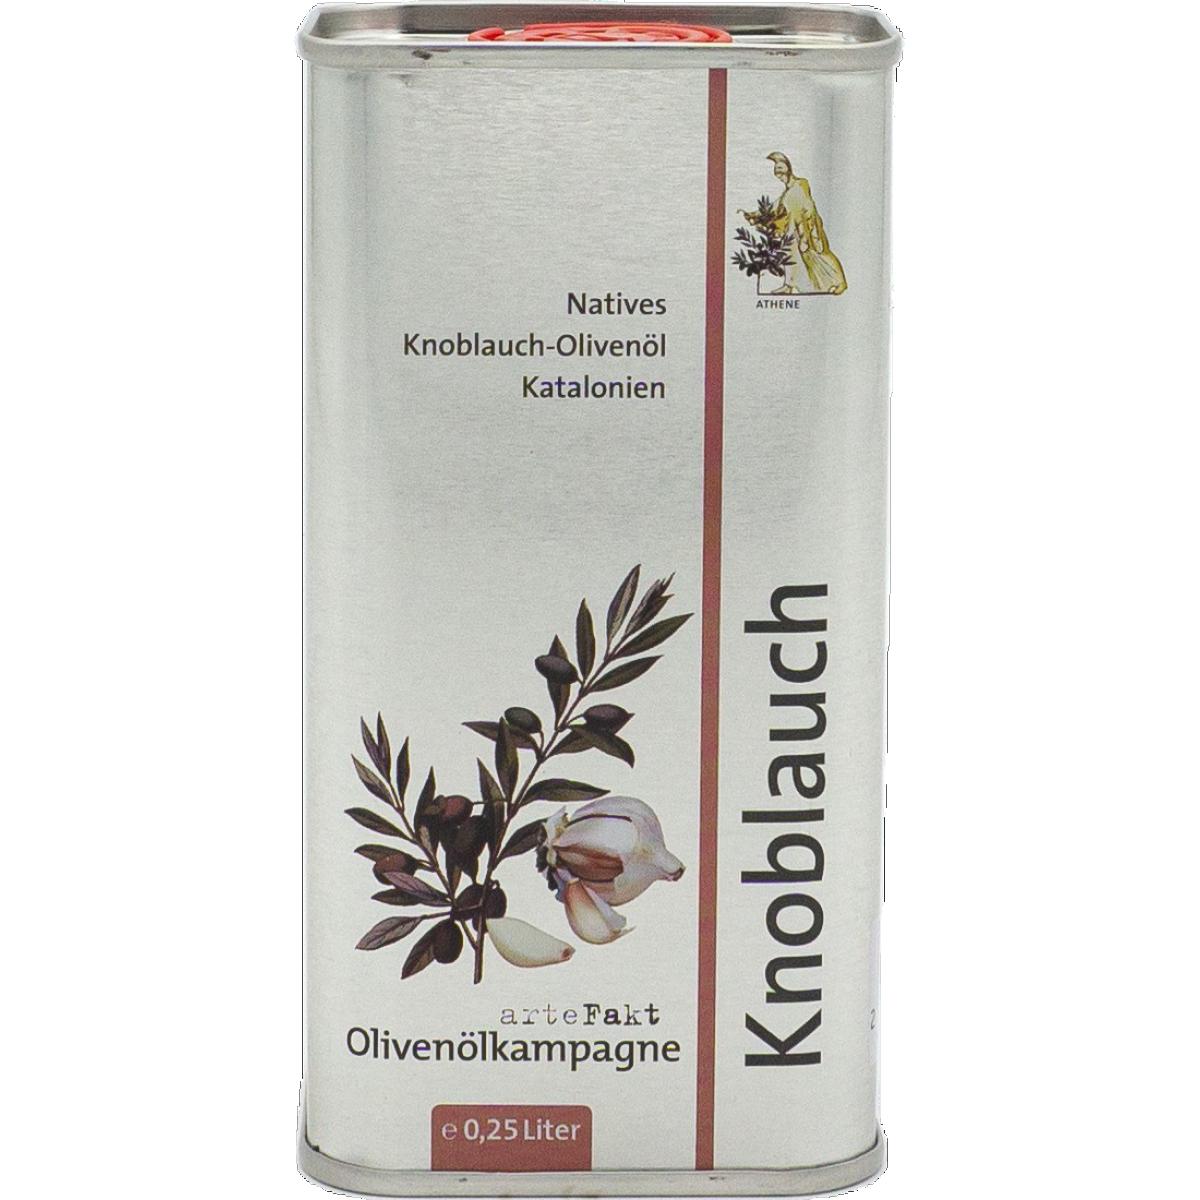 Bio Knoblauch-Olivenöl, nativ